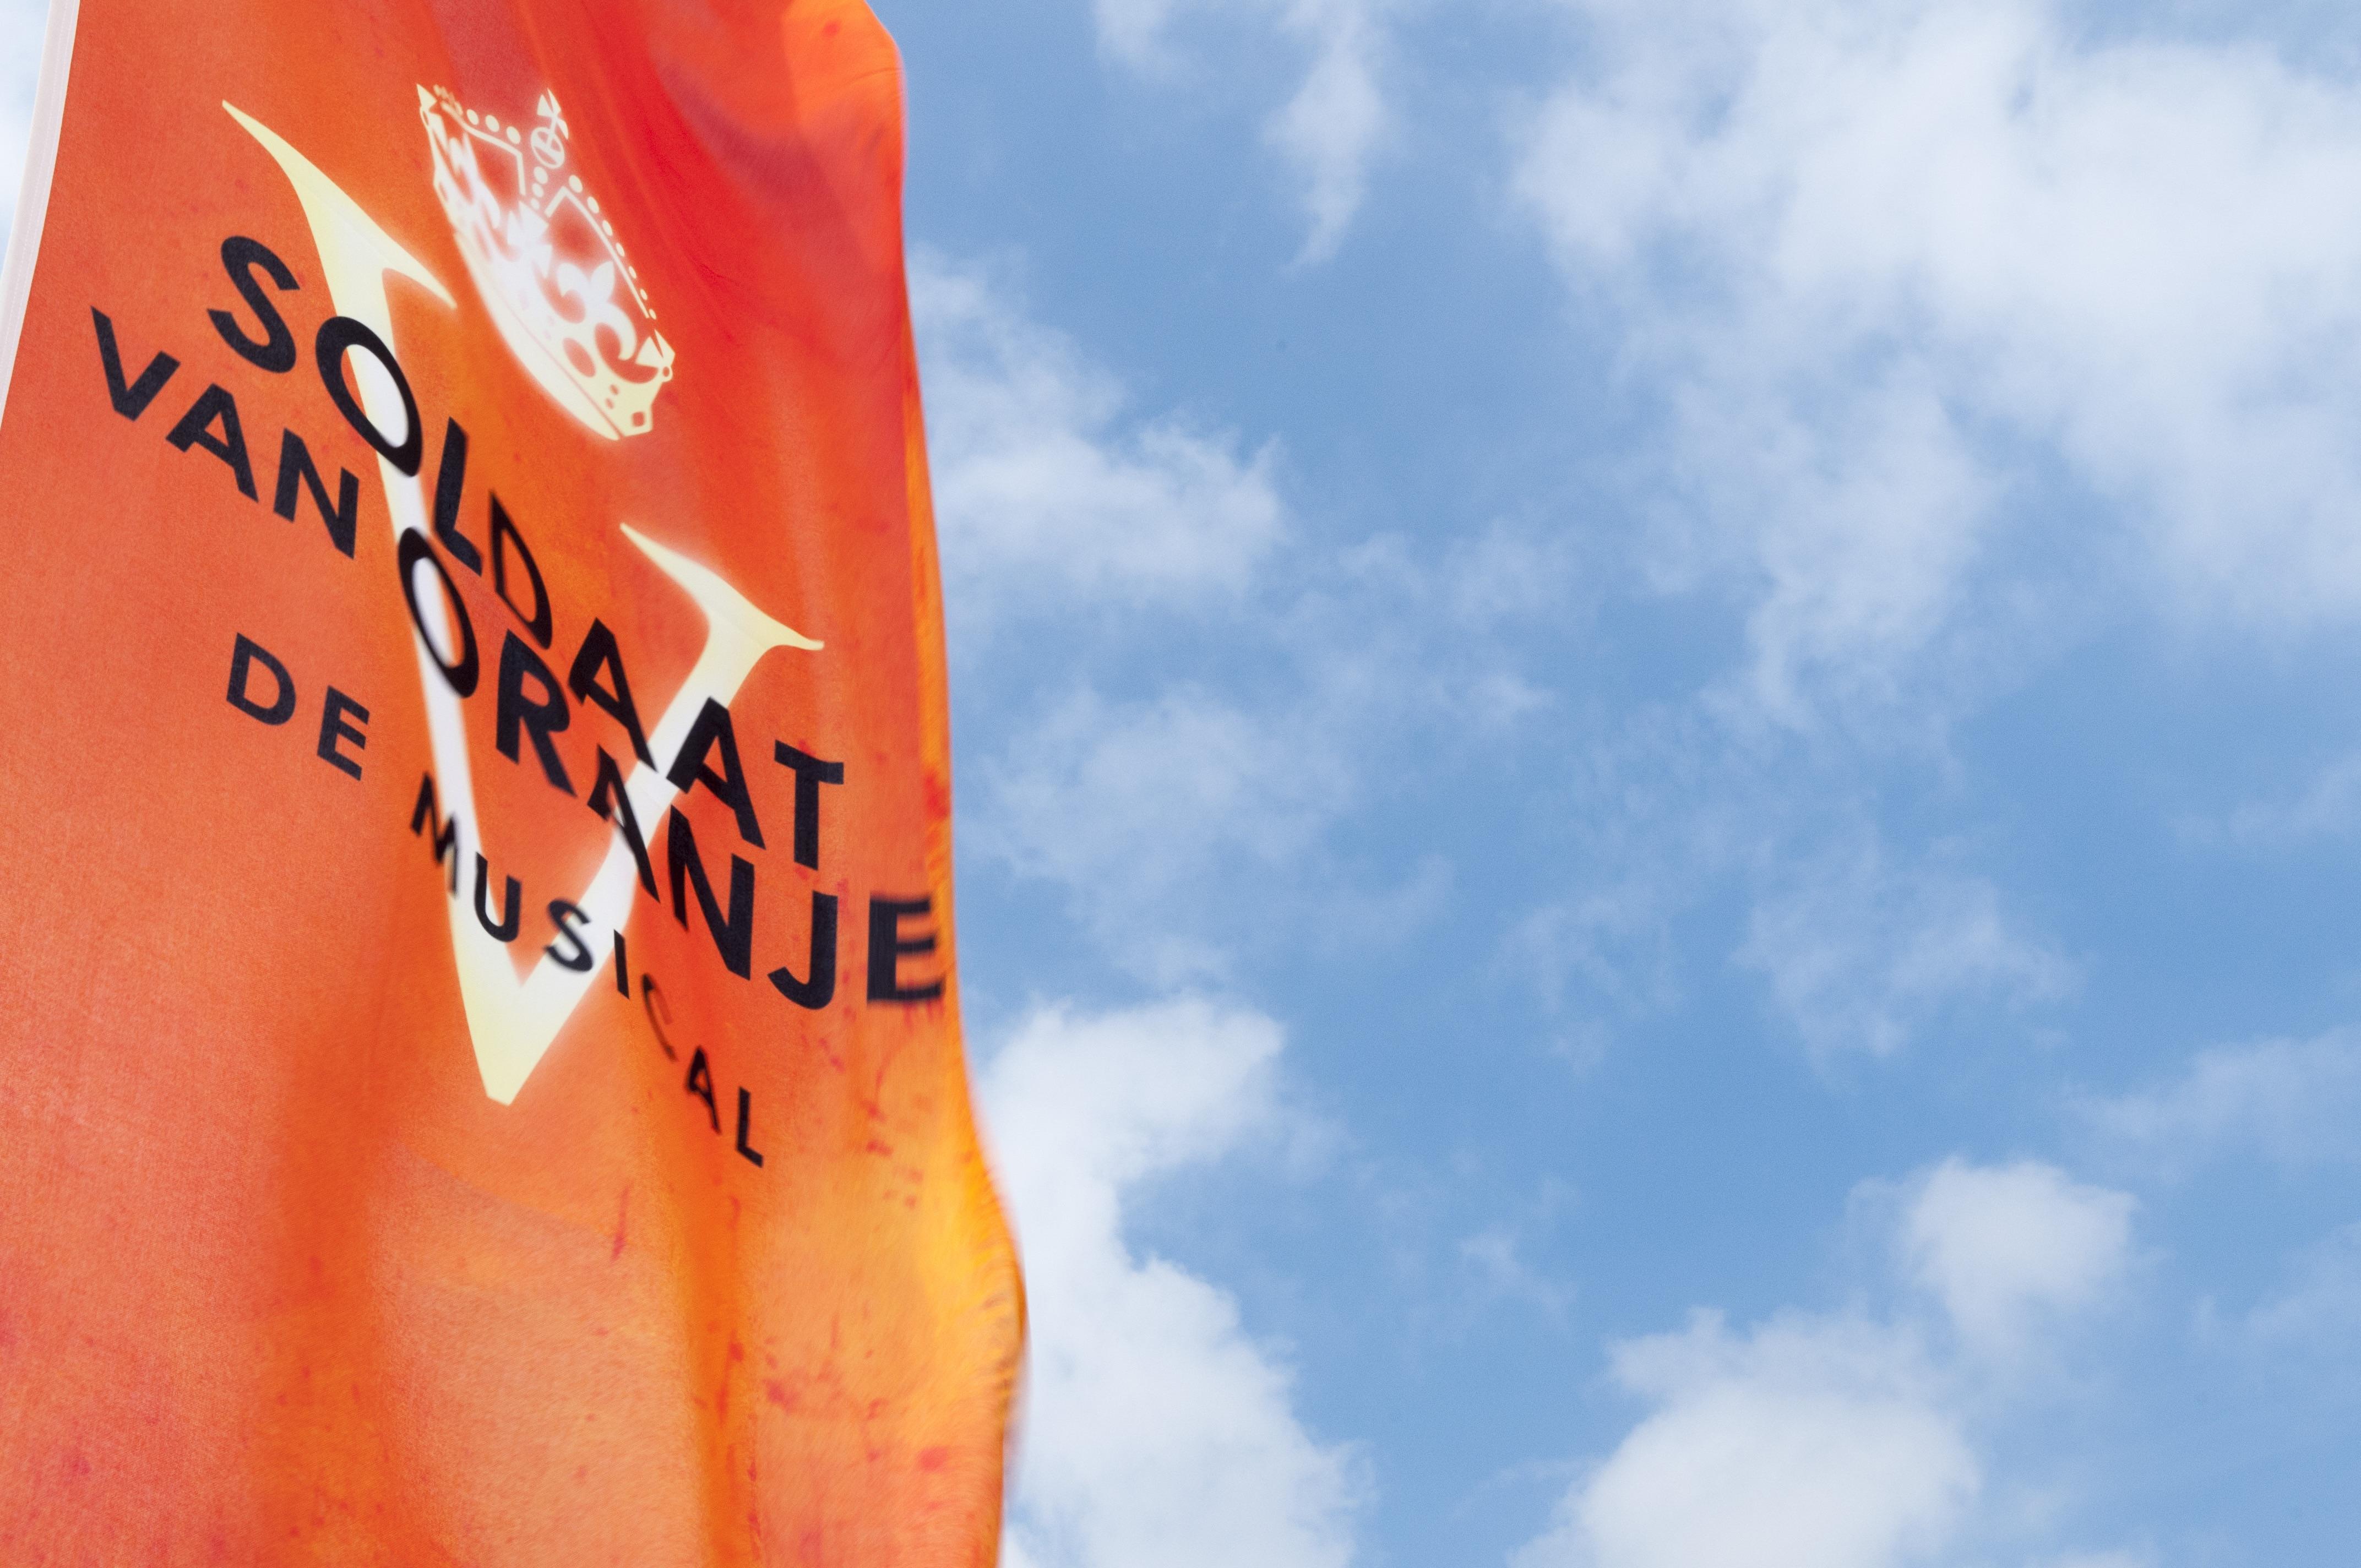 Soldaat van Oranje – De Musical nú verlengd t/m mei